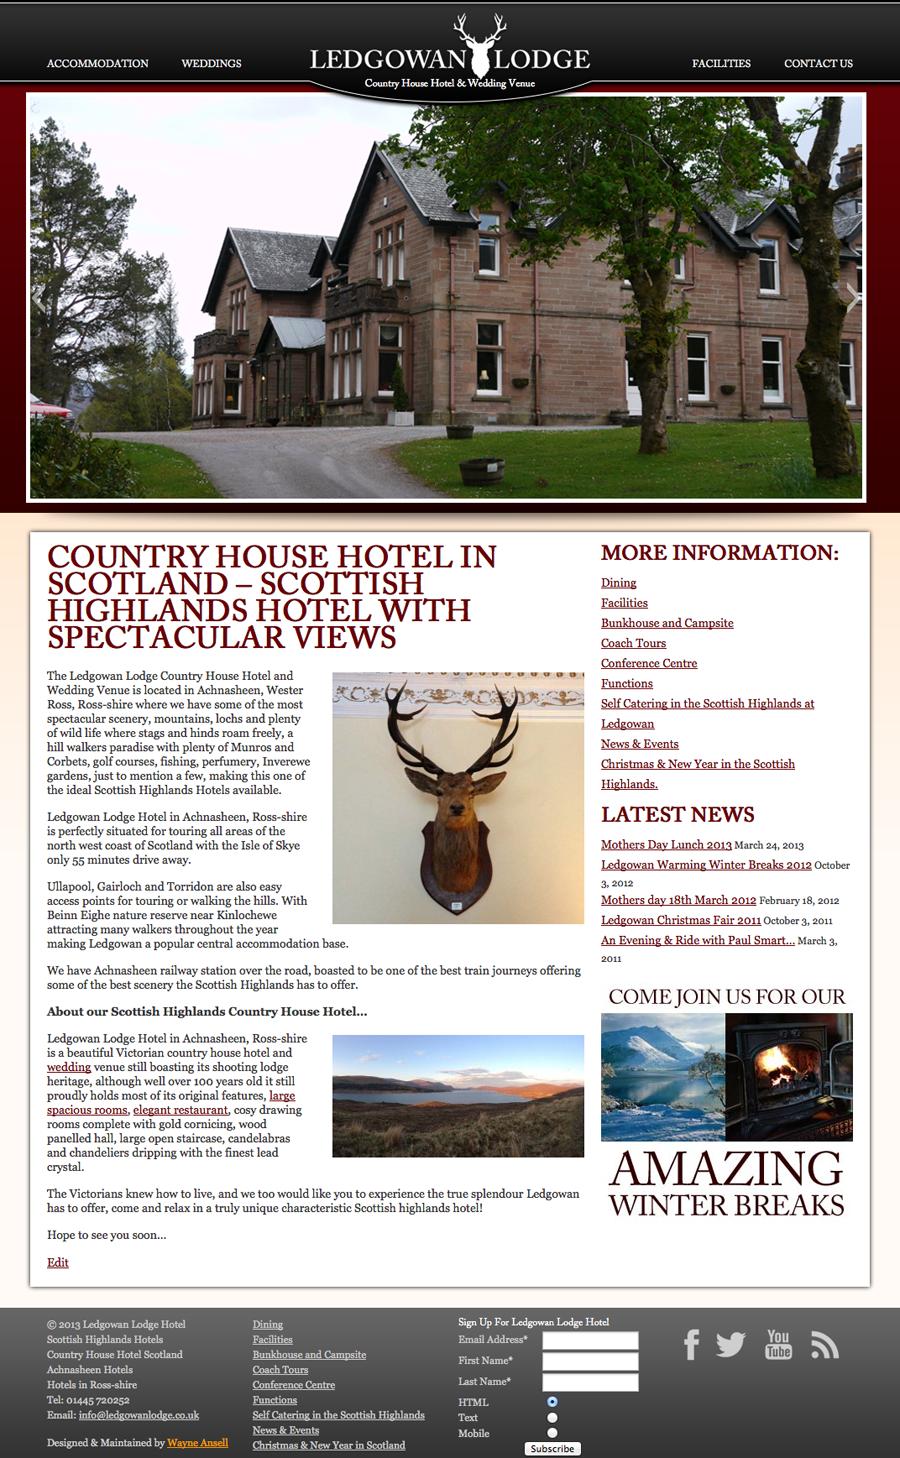 Ledgowan Lodge - New Website Design